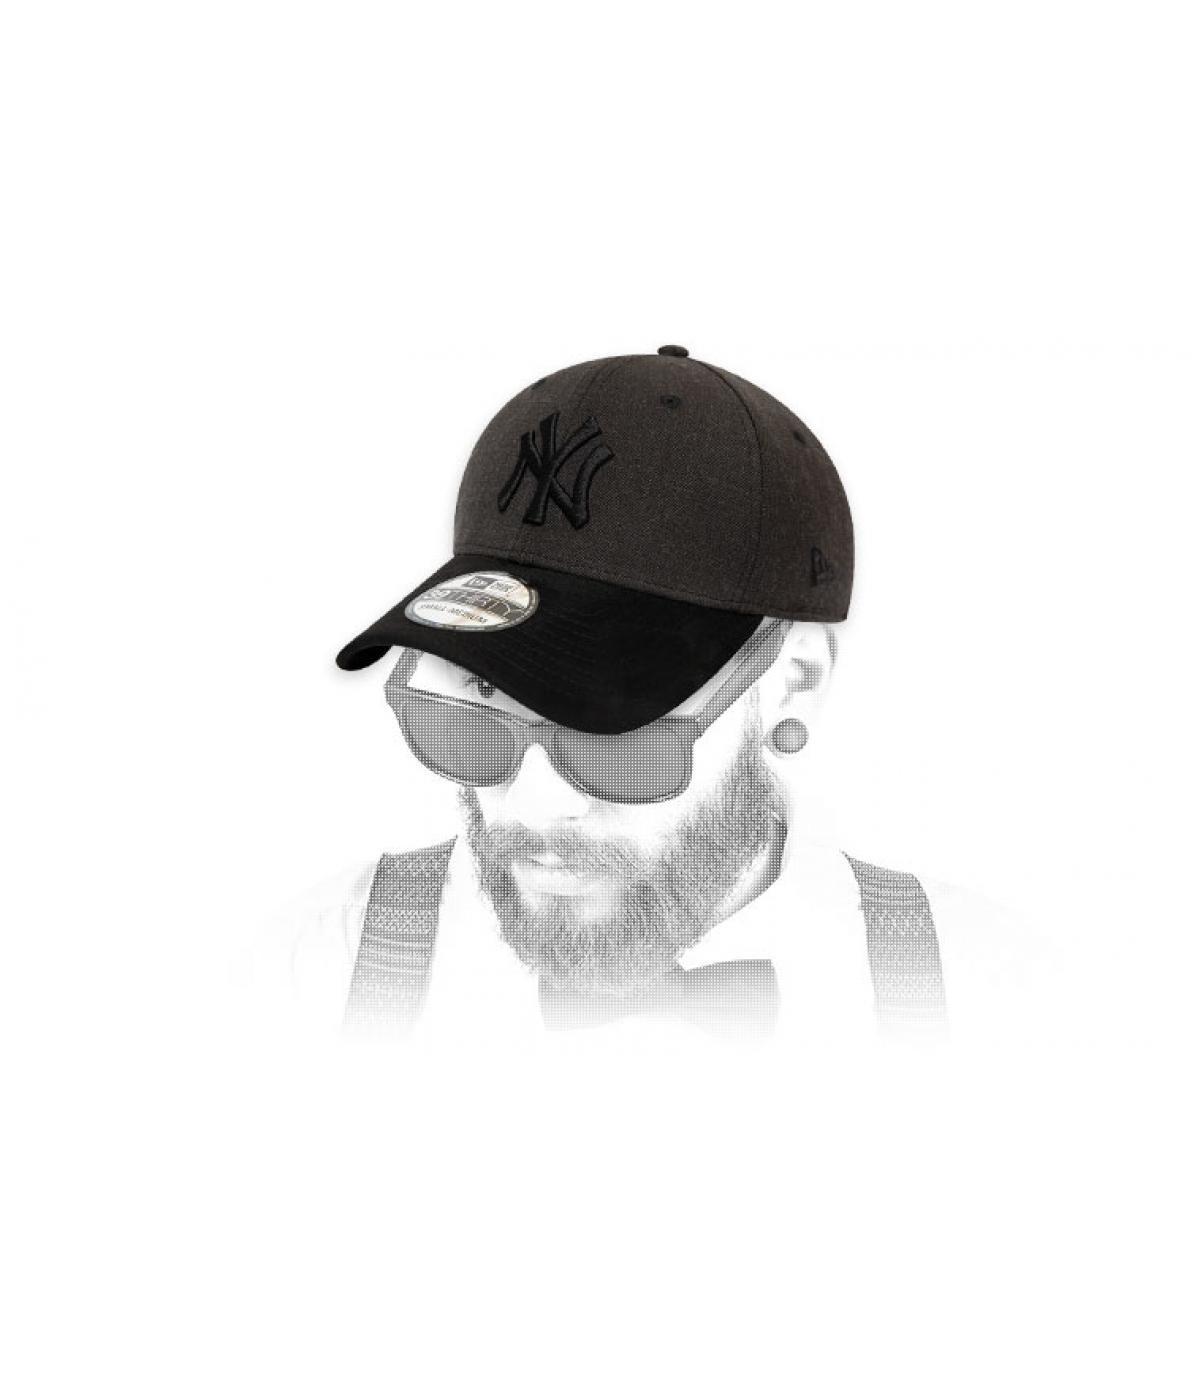 gorra NY gris negro ante